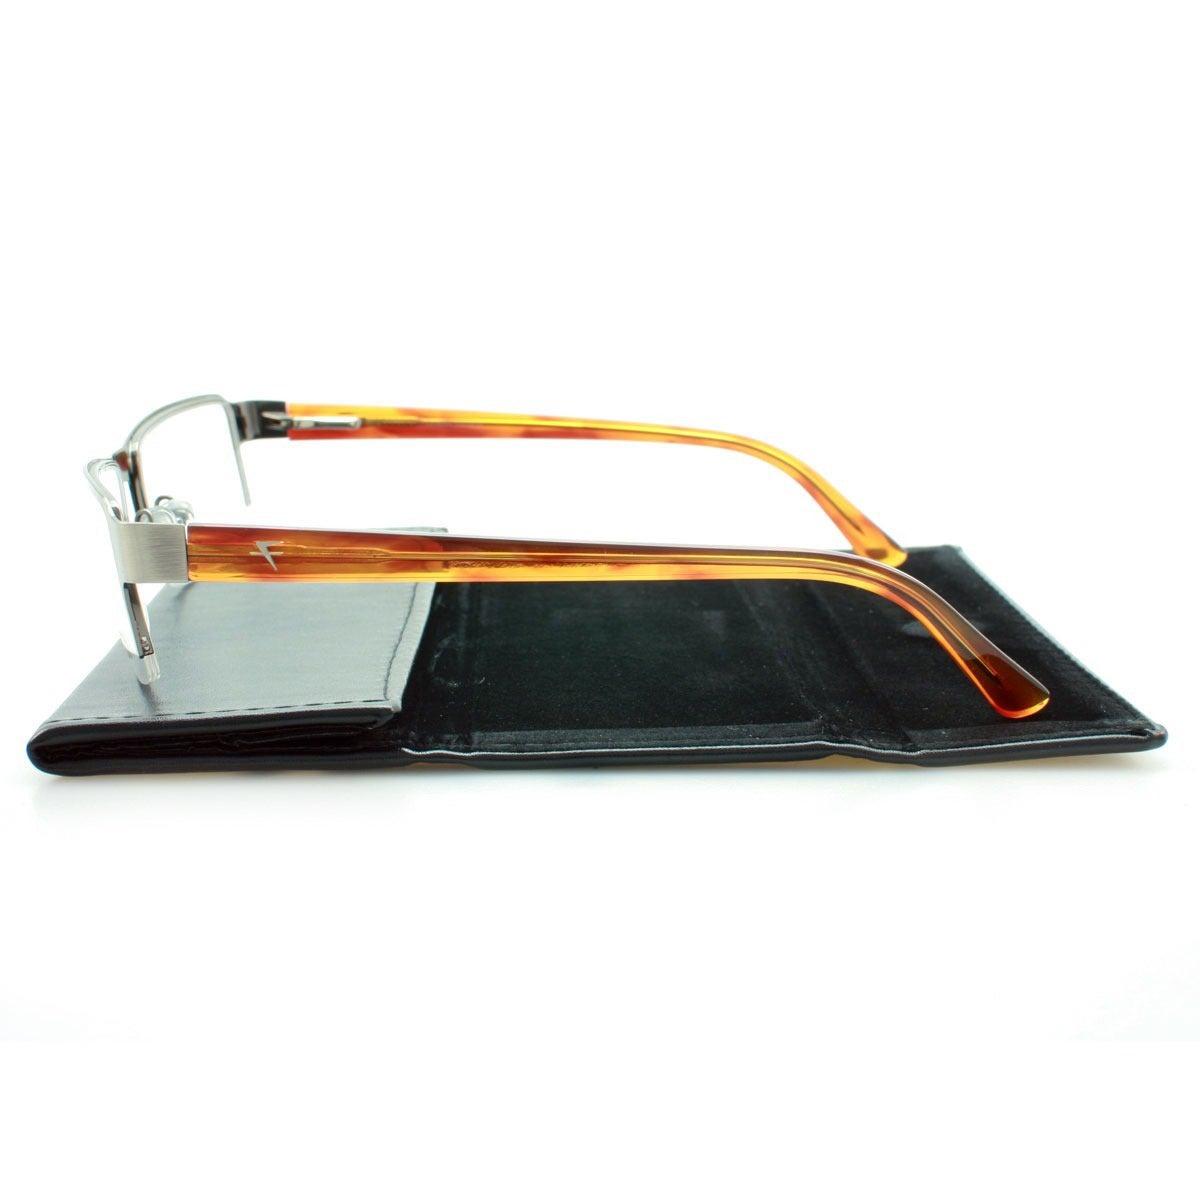 bea7027b85 Shop Fatheadz Men s J.D. XL Prescription Eyeglasses - Free Shipping On  Orders Over  45 - Overstock - 9837107